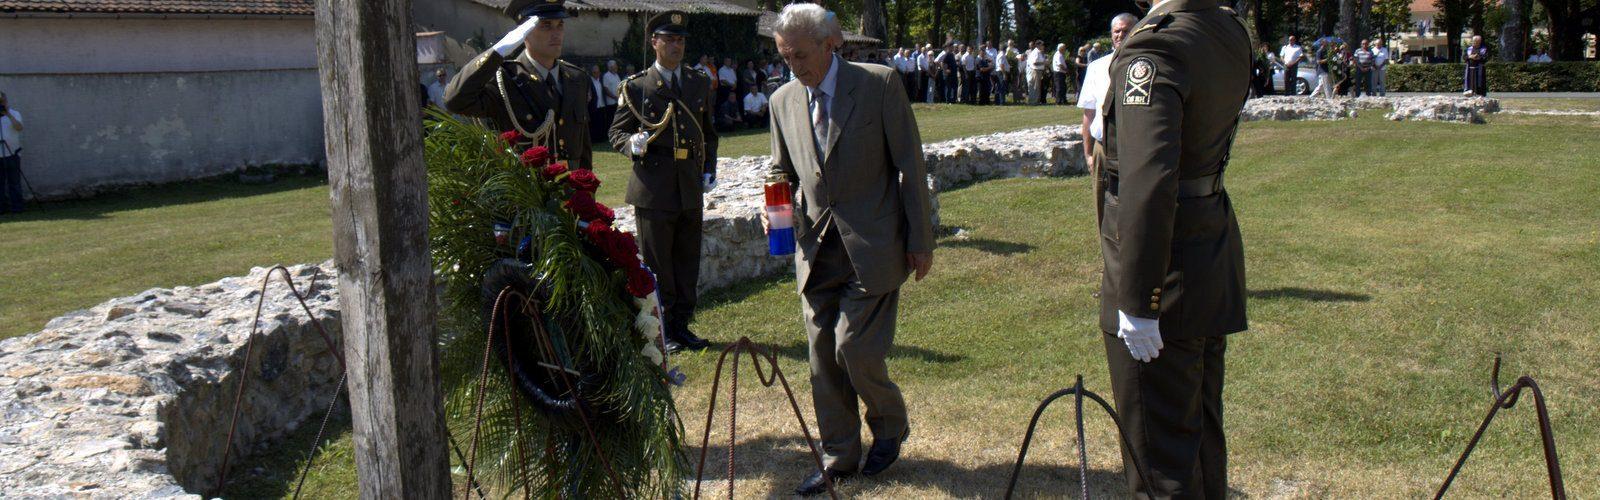 Preminuo počasni građanin Grada Gline, stožerni general Petar Stipetić